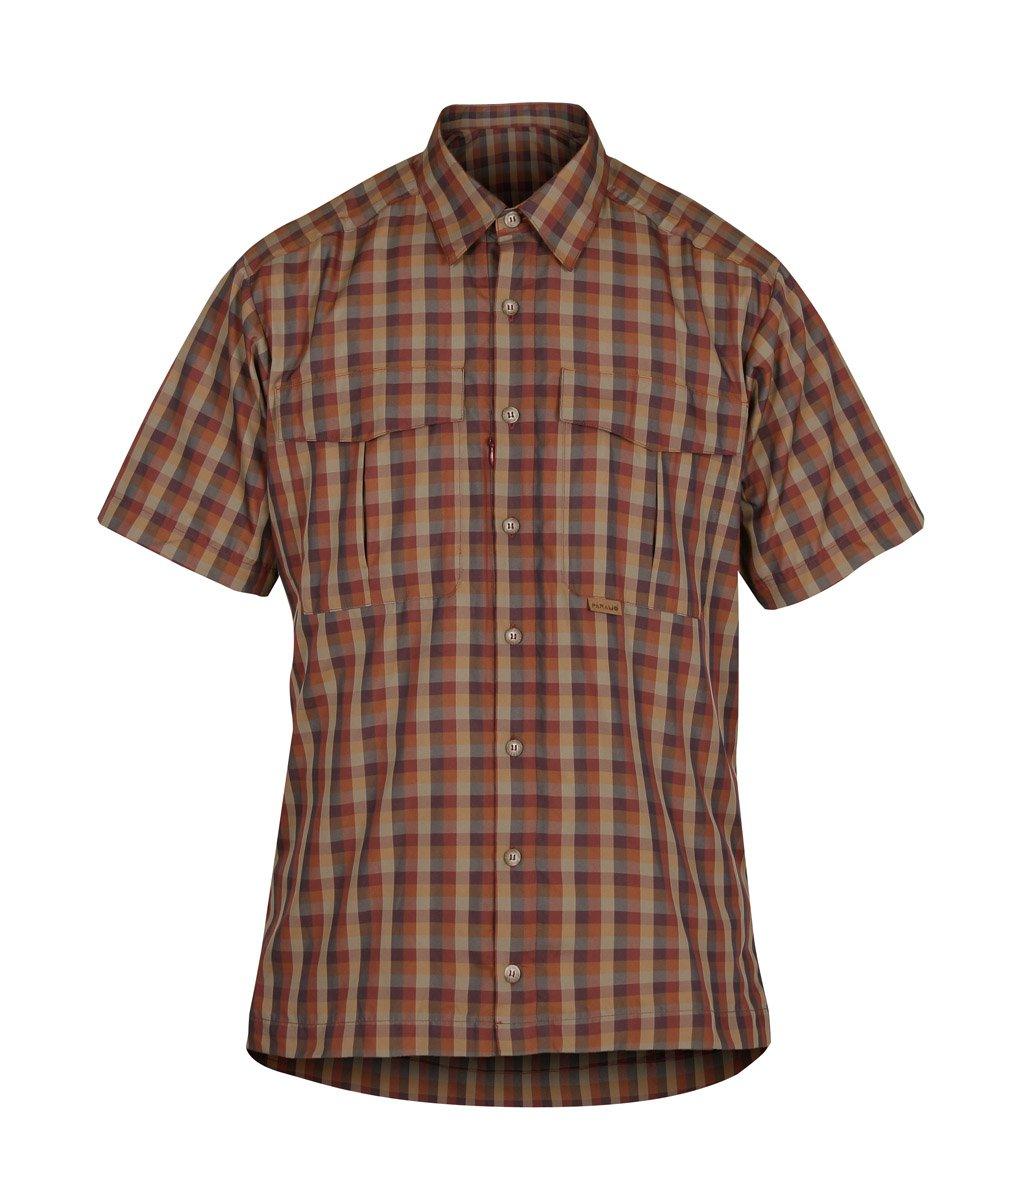 Paramo Directional Clothing Systems Herren KEA Light Short Sleeved Oberteil